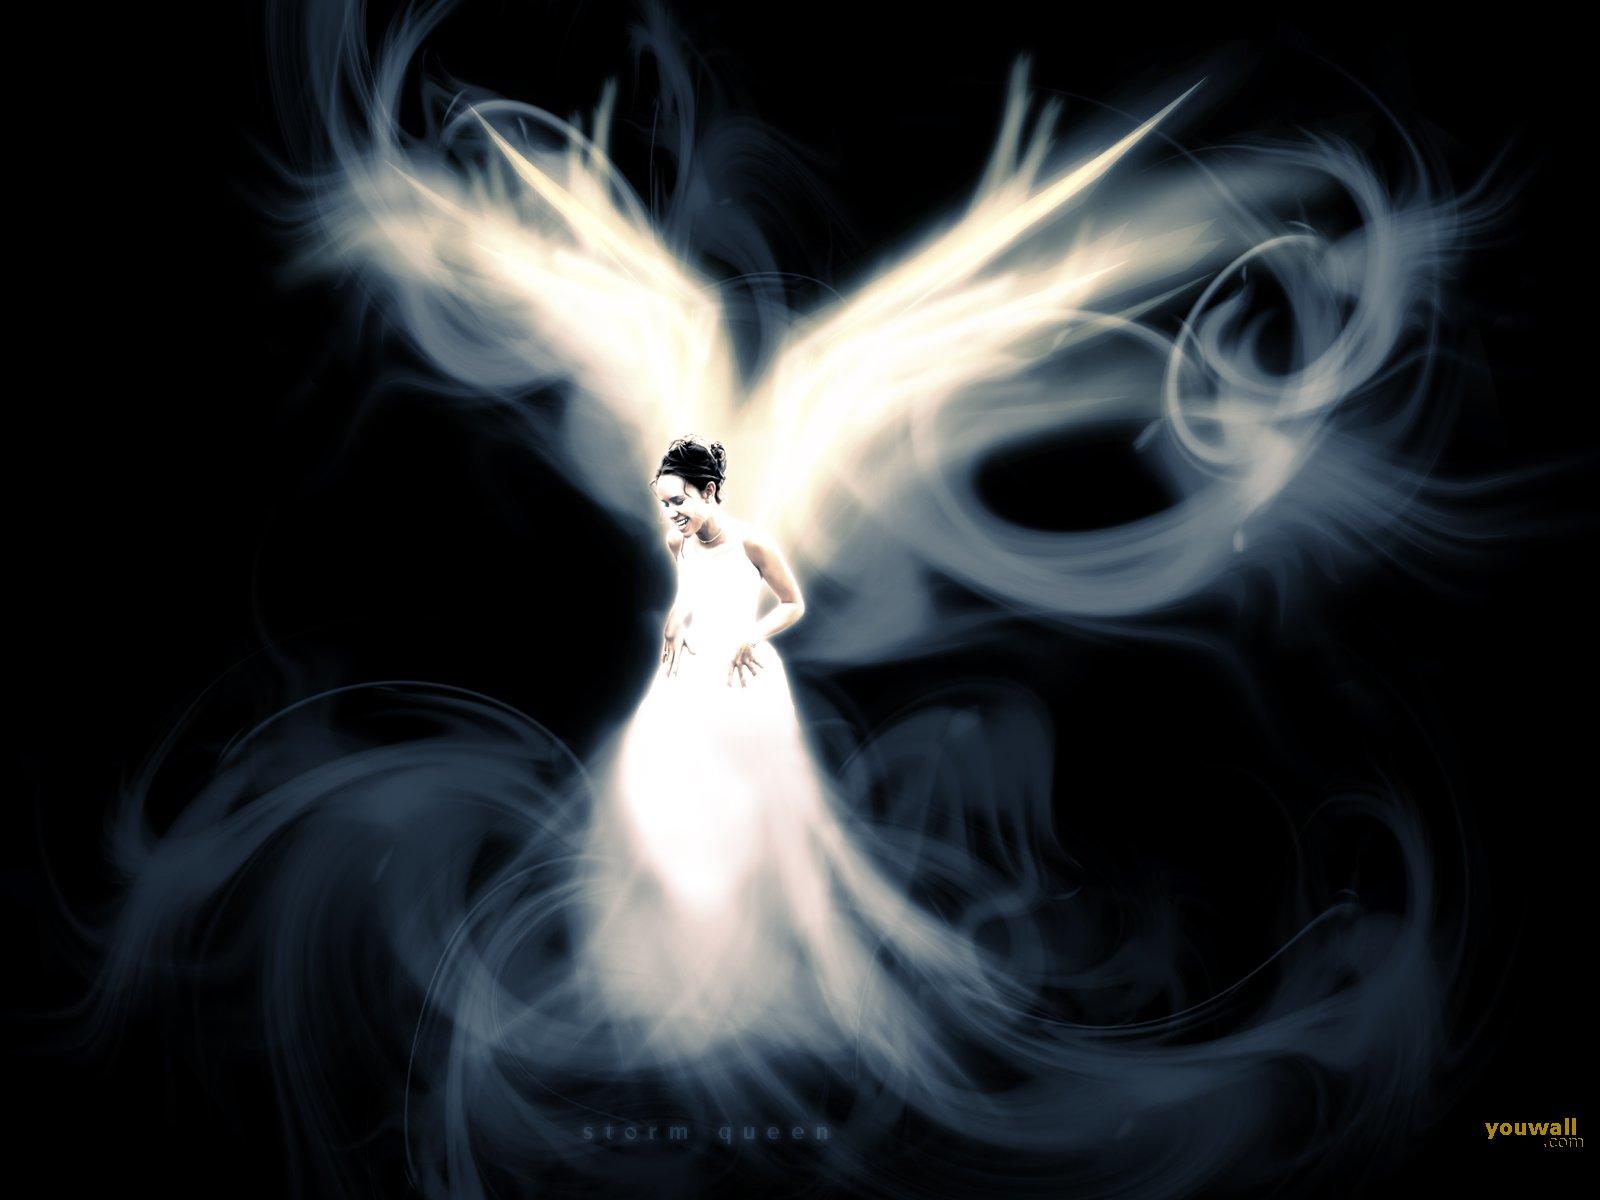 YouWall   Angel Wallpaper   wallpaperwallpapersfree wallpaperphoto 1600x1200